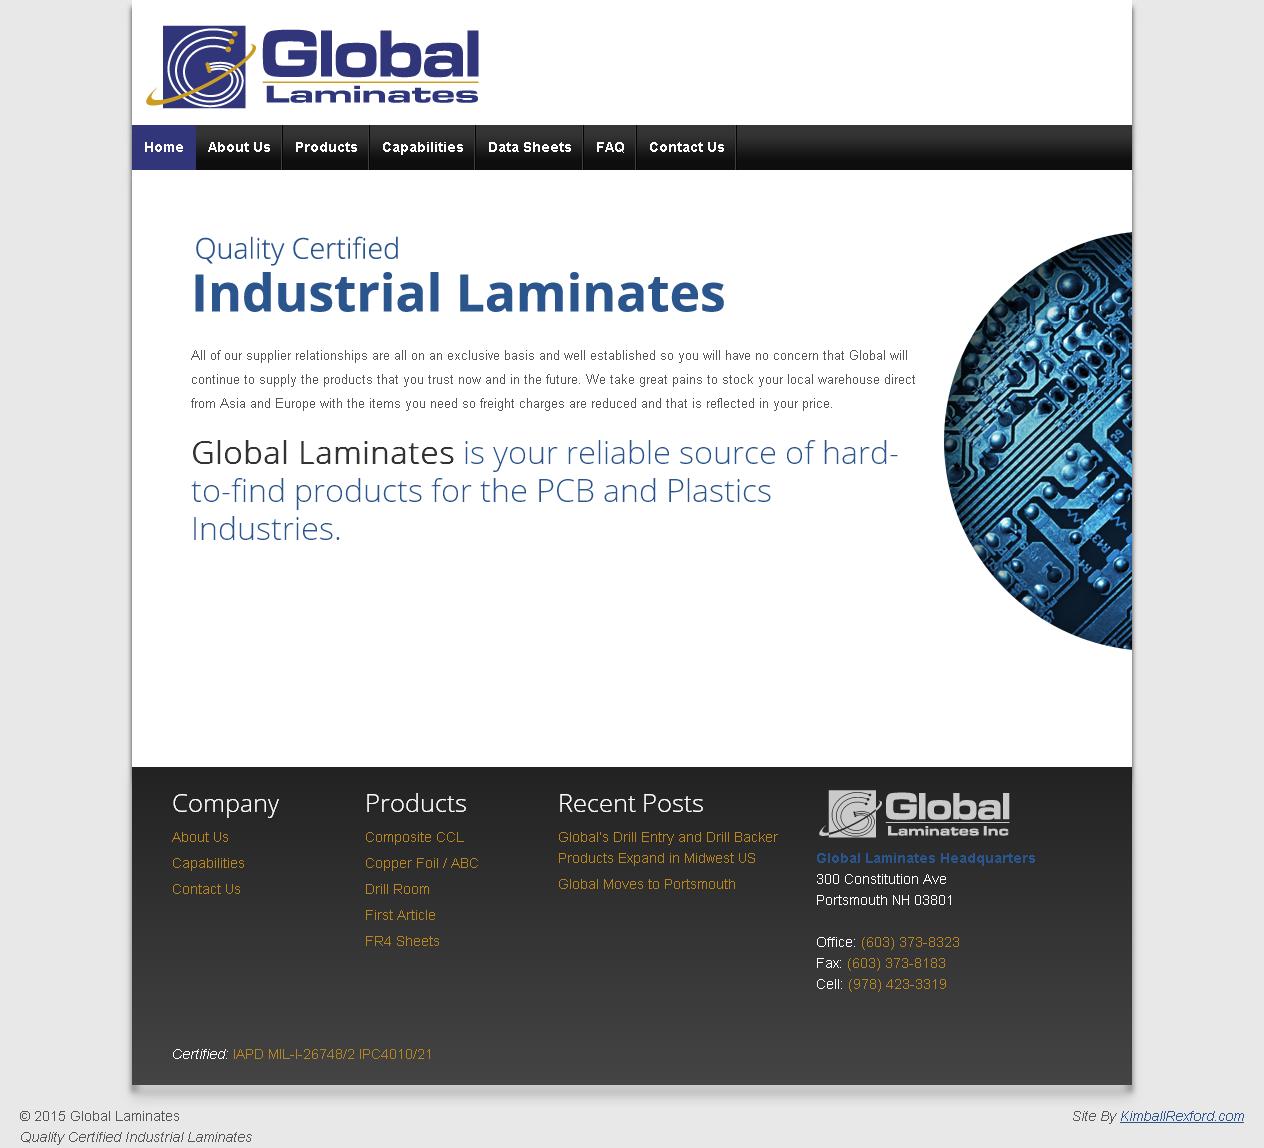 Global Laminates